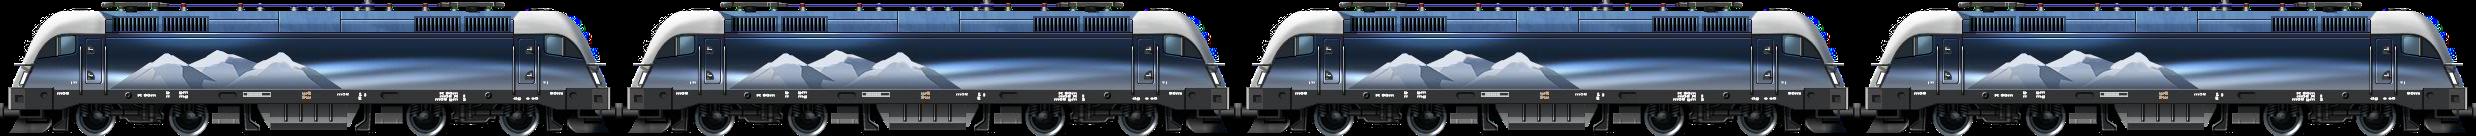 Alp Express I